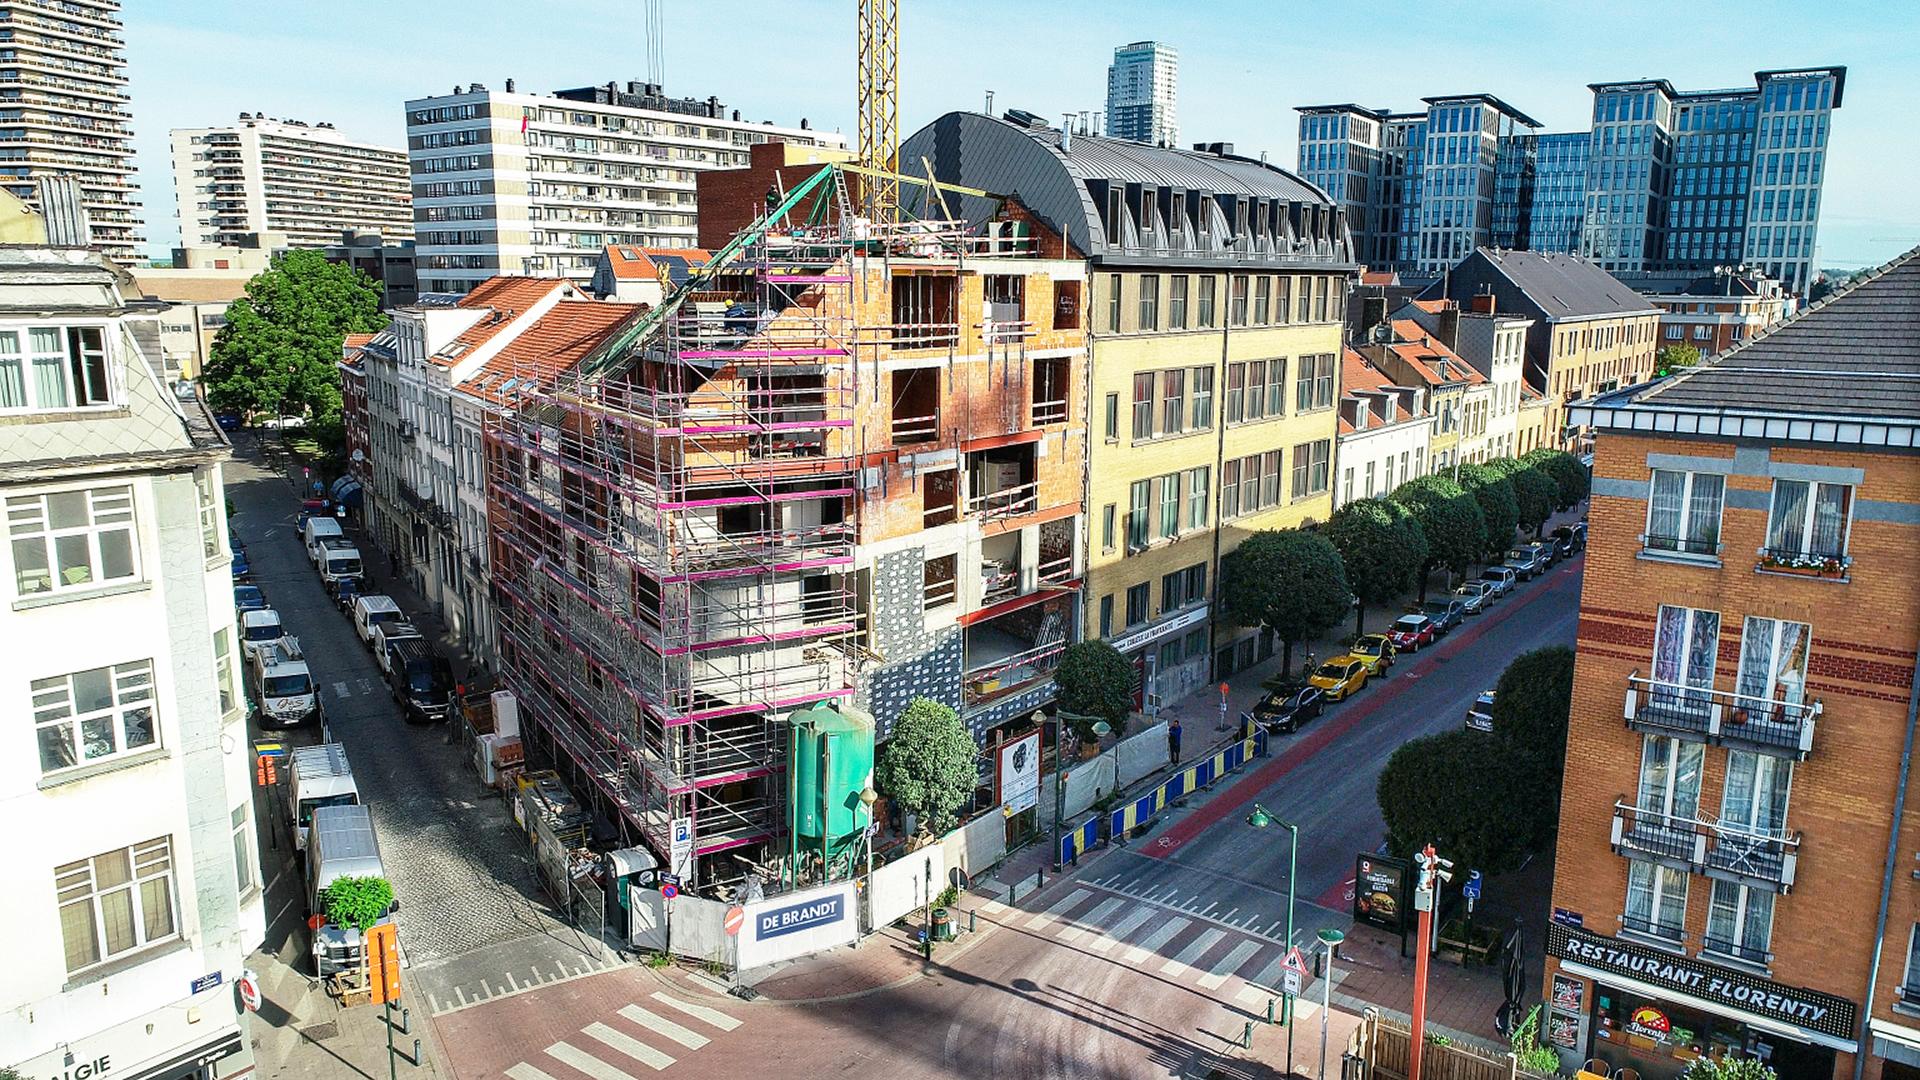 Dronap-Brussel-Harmoniestraat2.5_Still024-HD